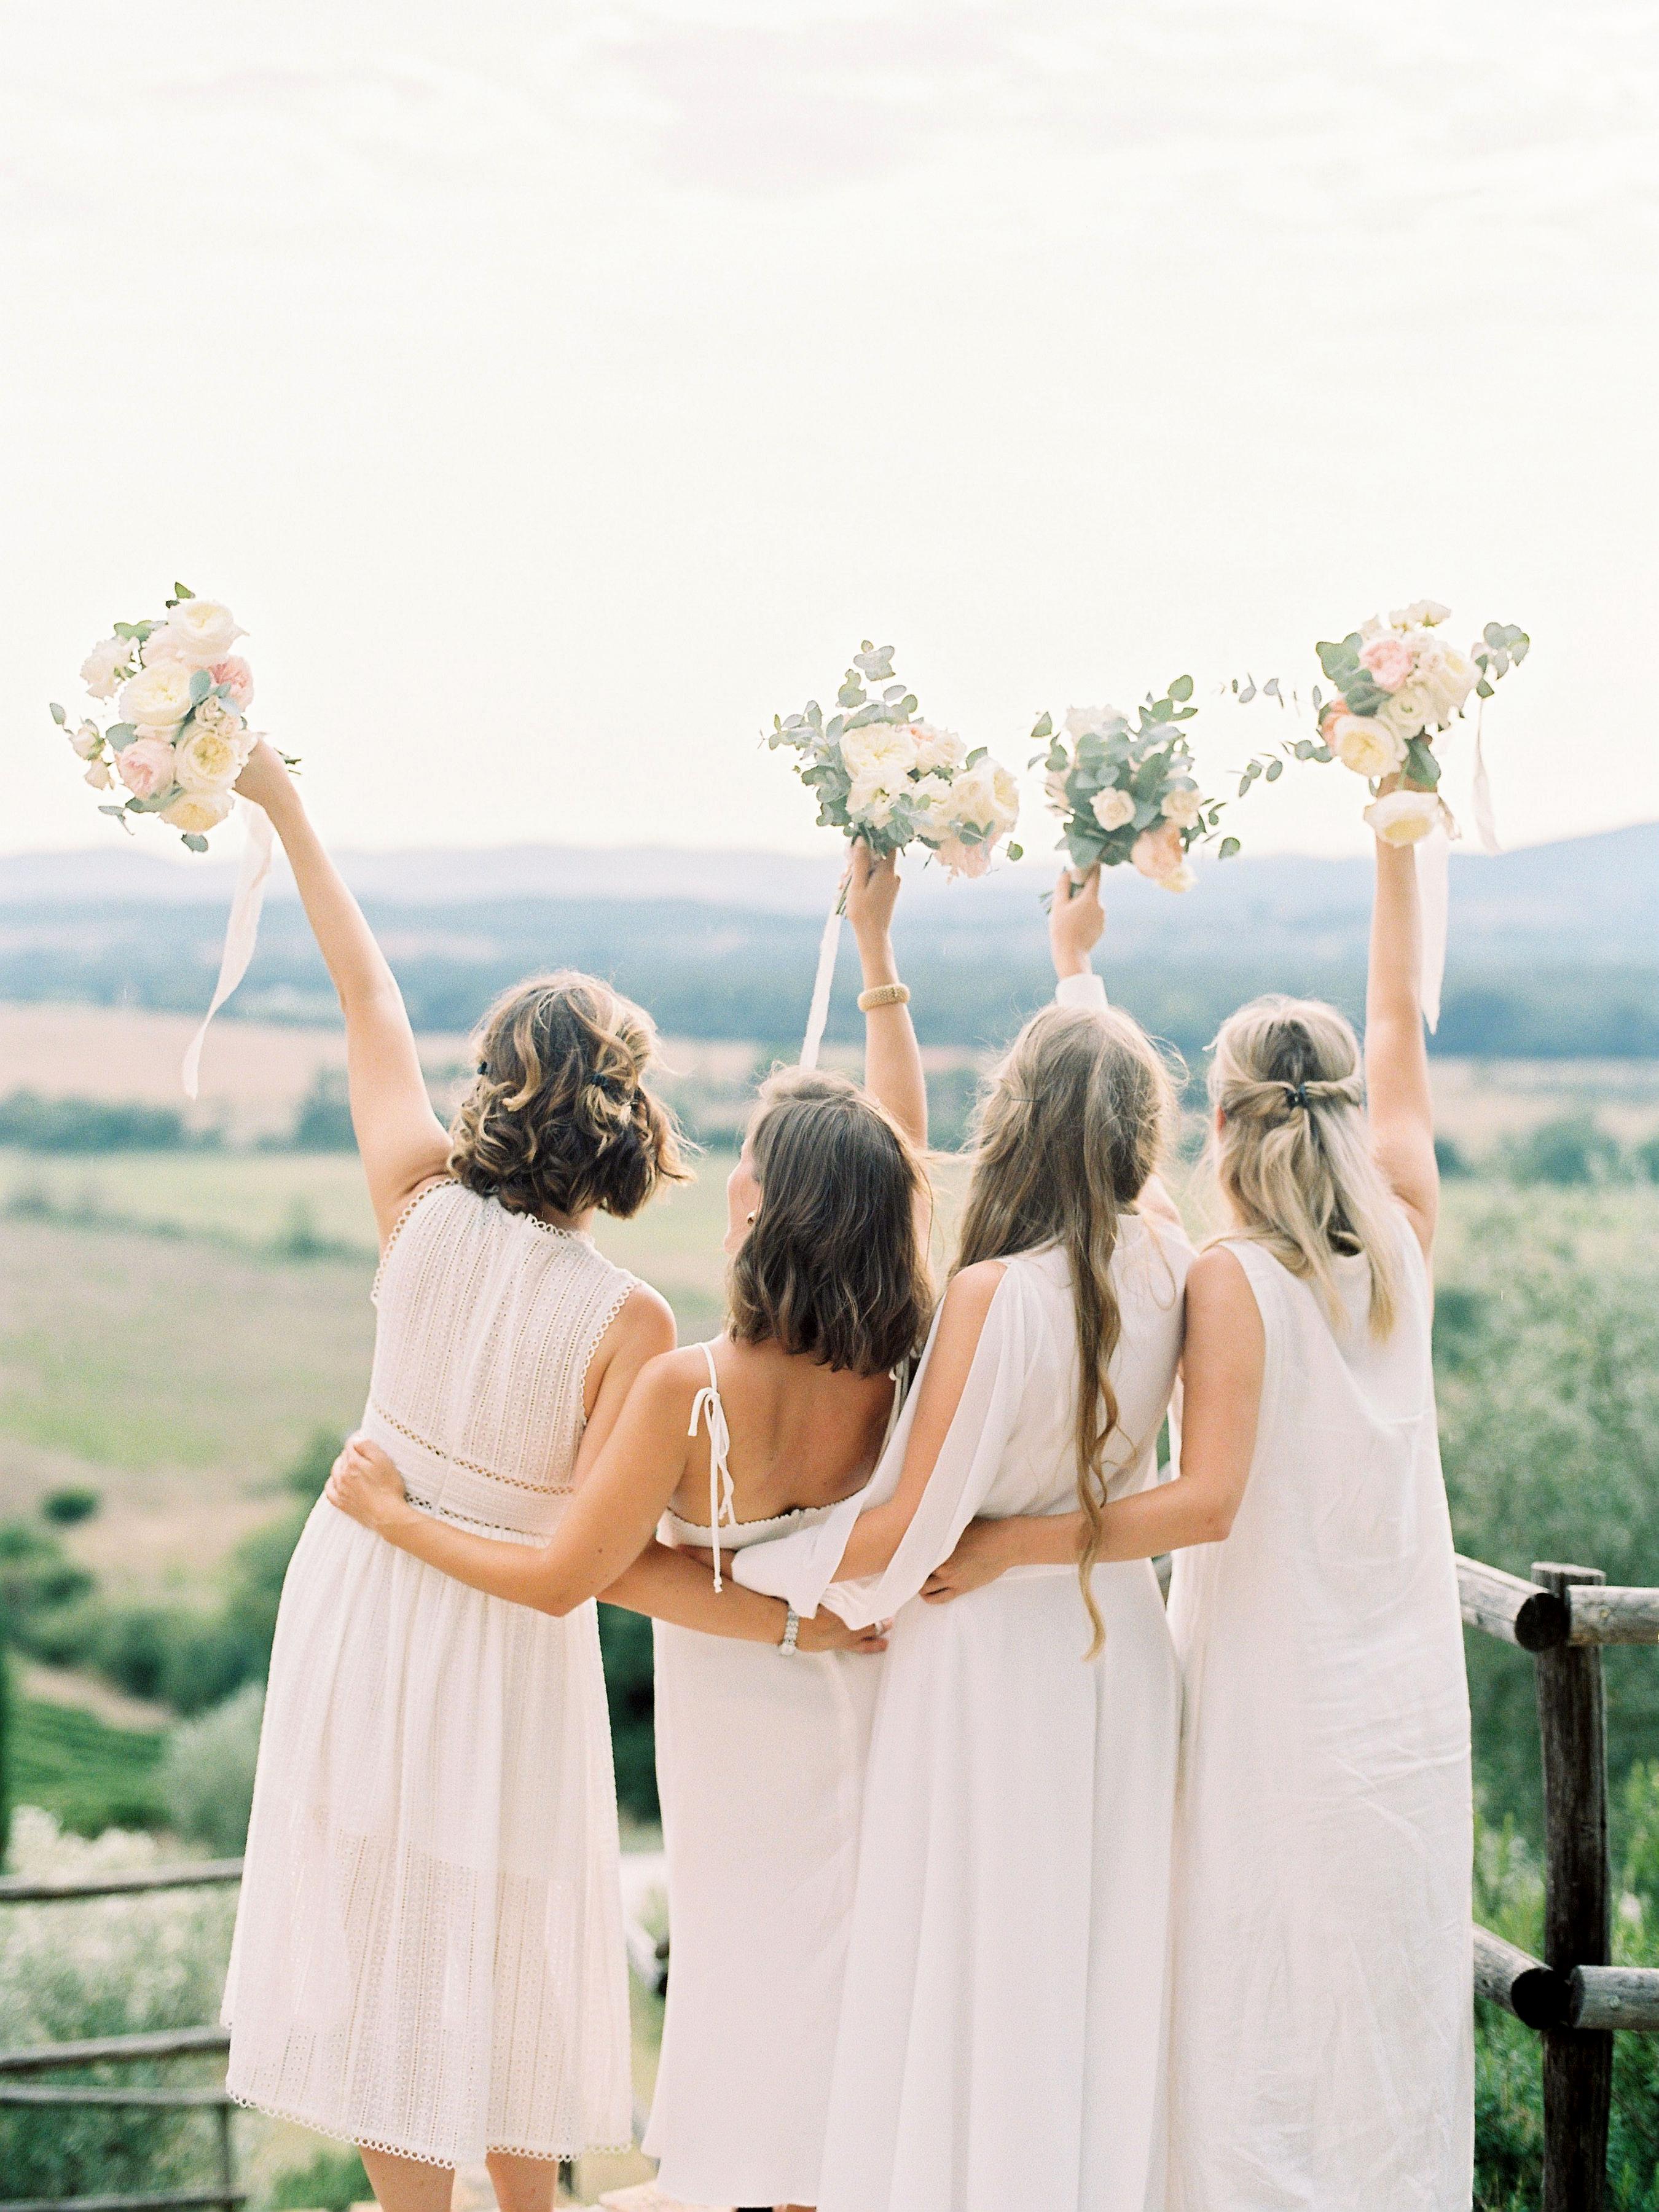 kseniya sadhir wedding italy bridesmaids waving bouquets